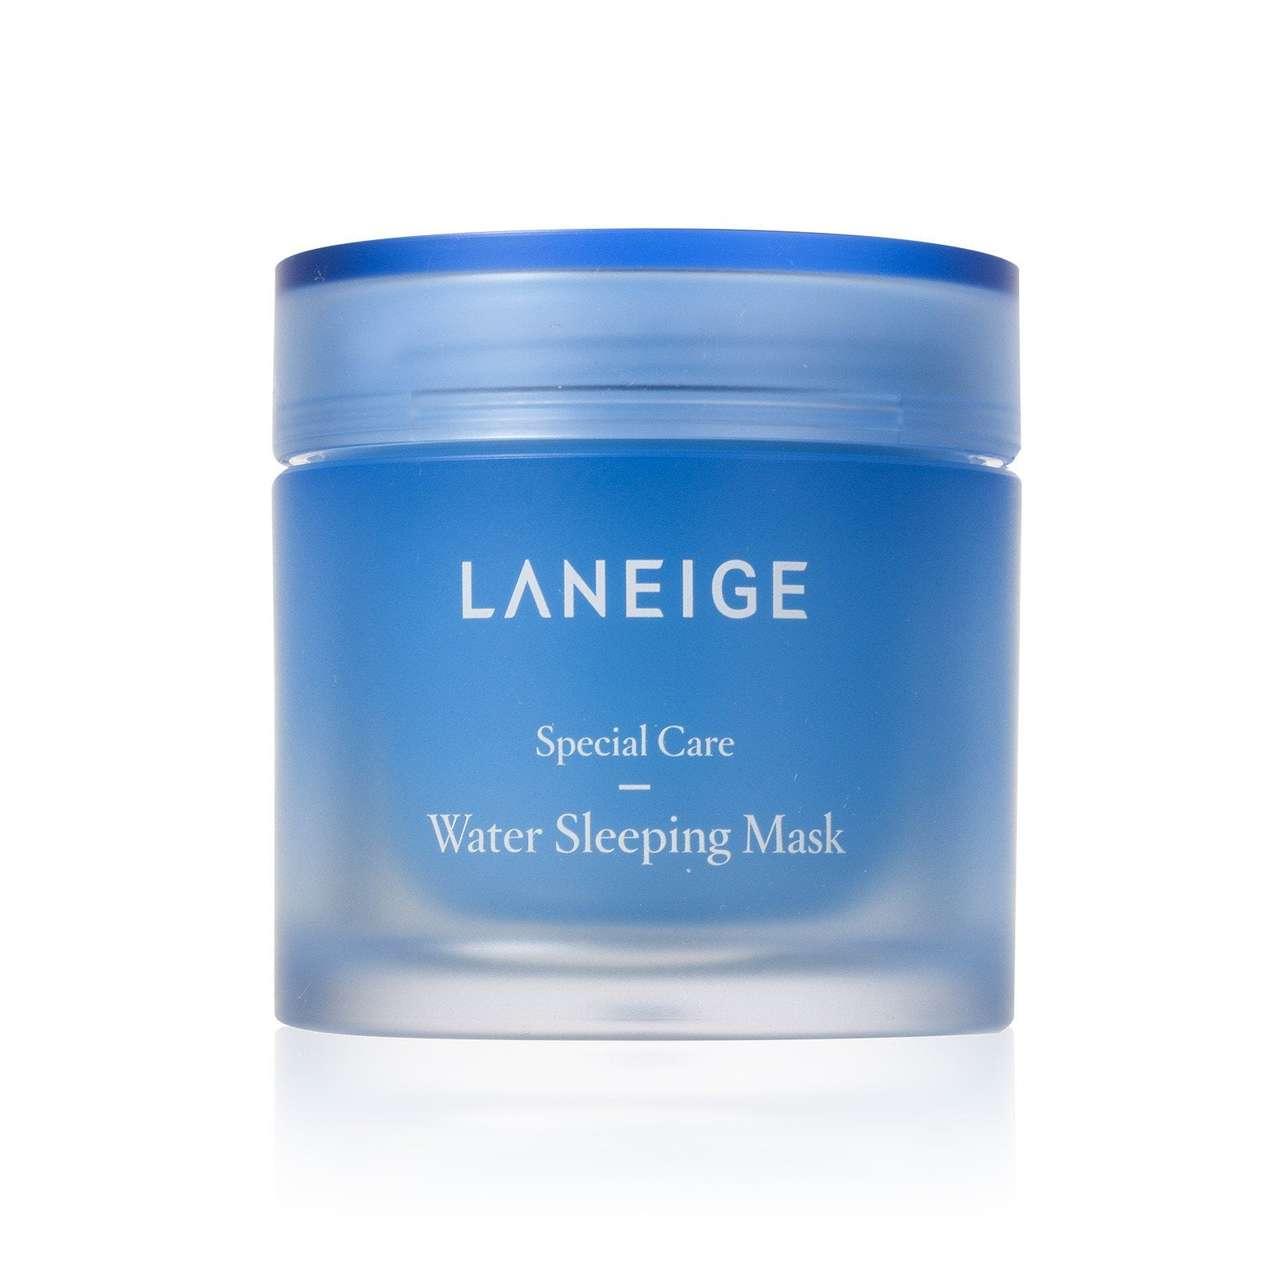 laneige water sleeping mask moisturizer